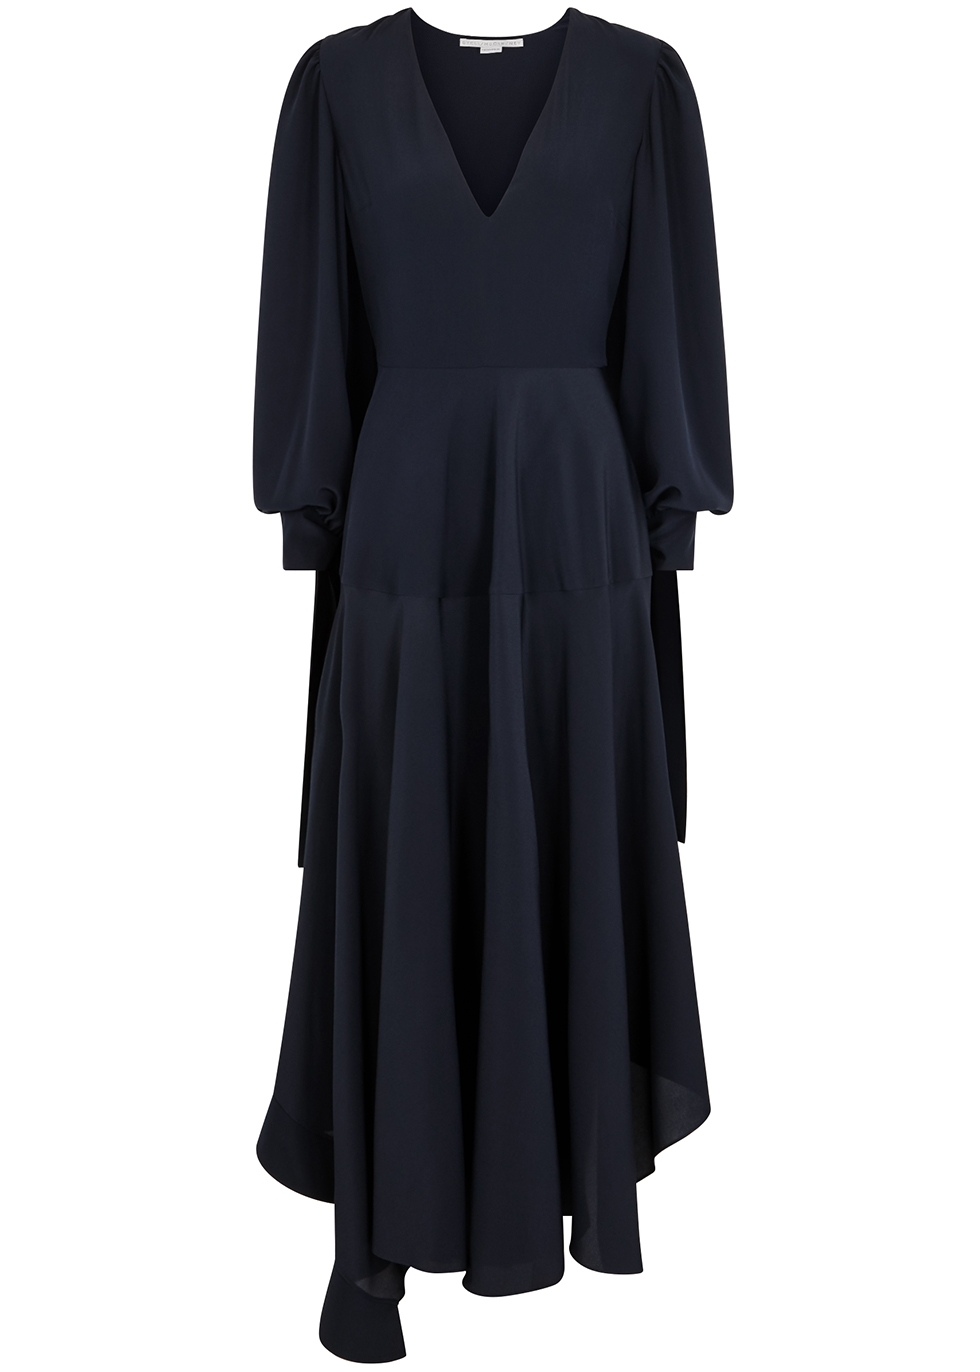 e5ca40dd0 Stella McCartney Navy silk crepe de chine dress - Harvey Nichols